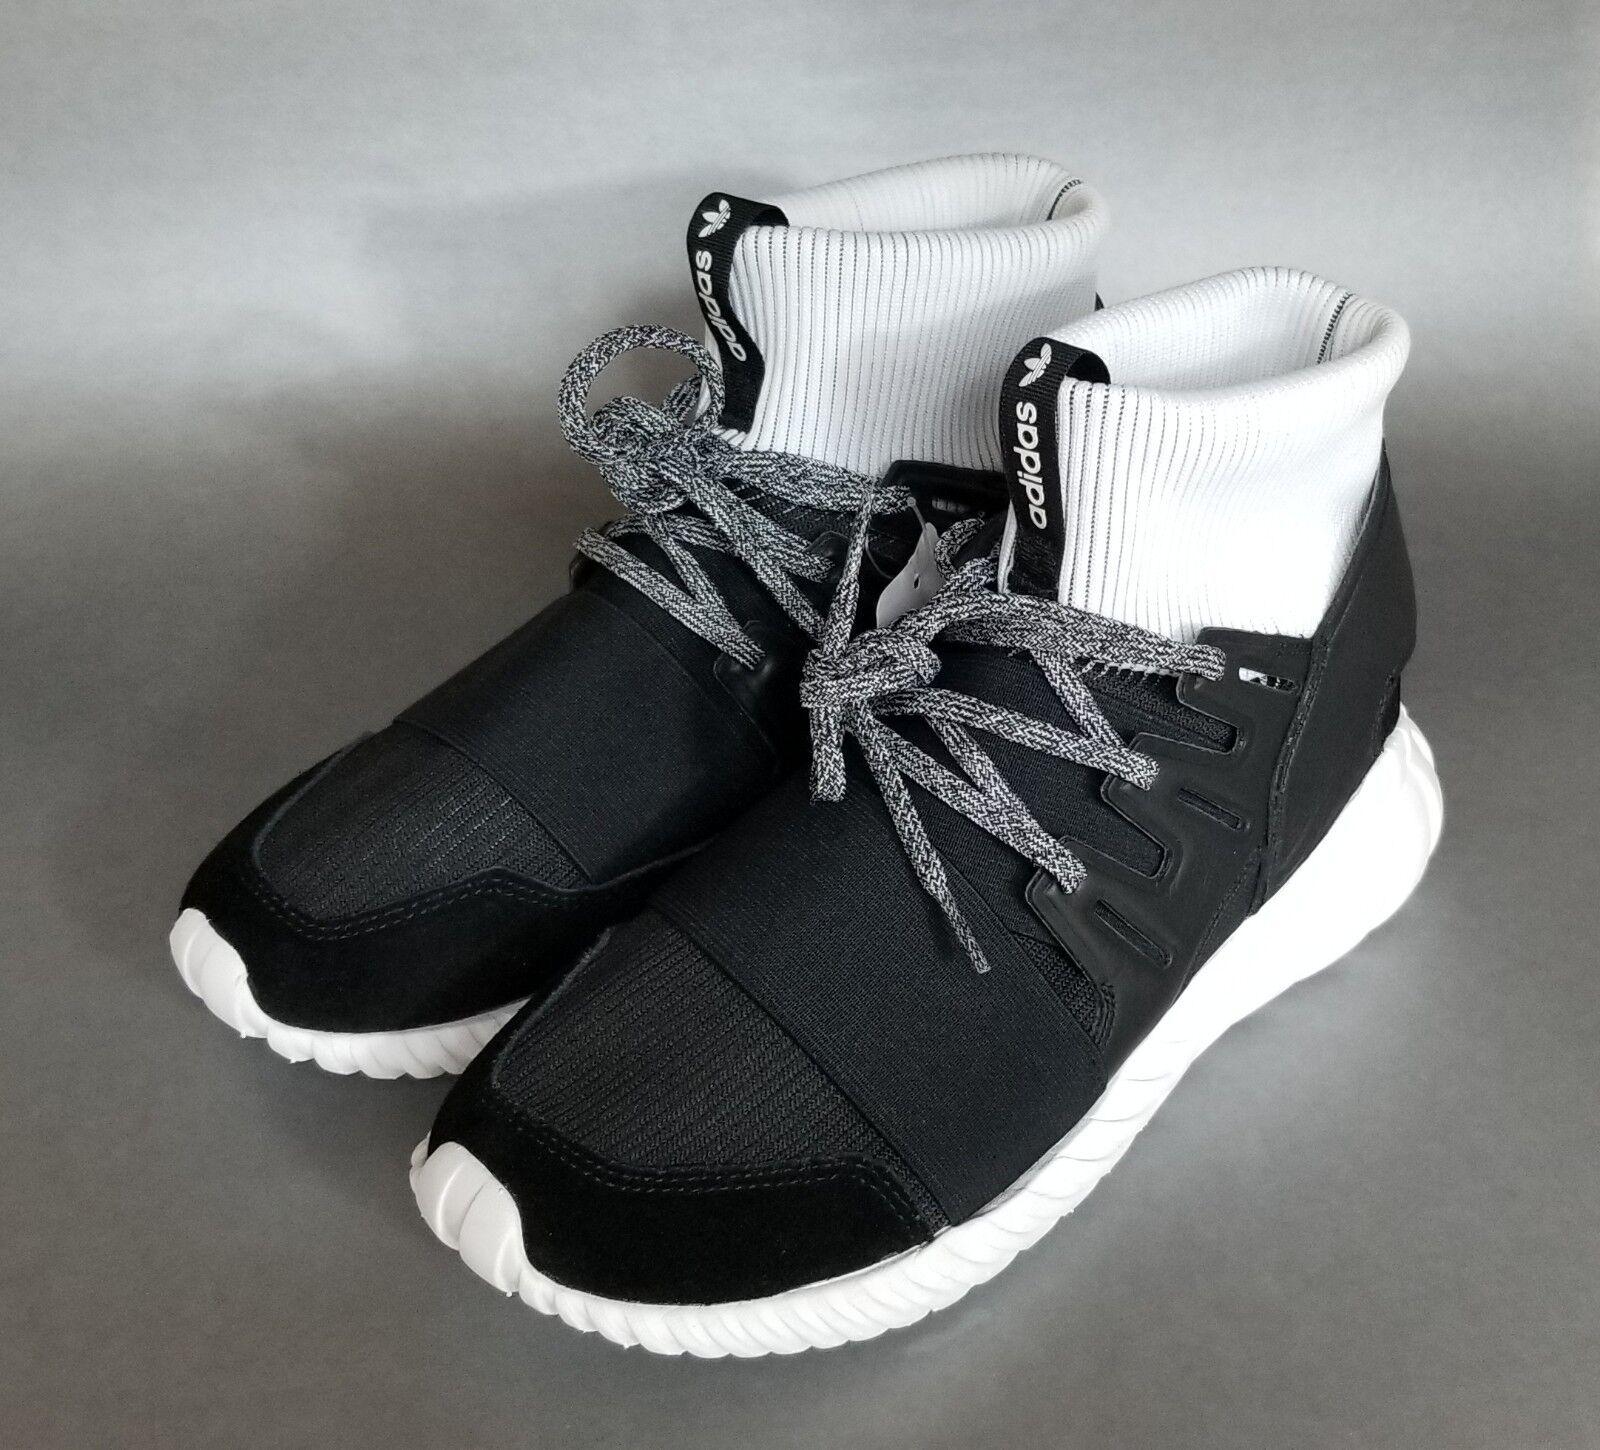 ADIDAS Tubular Doom Black White Ver. BA7555 Men's shoes Size 8, 9 or 11.5 New